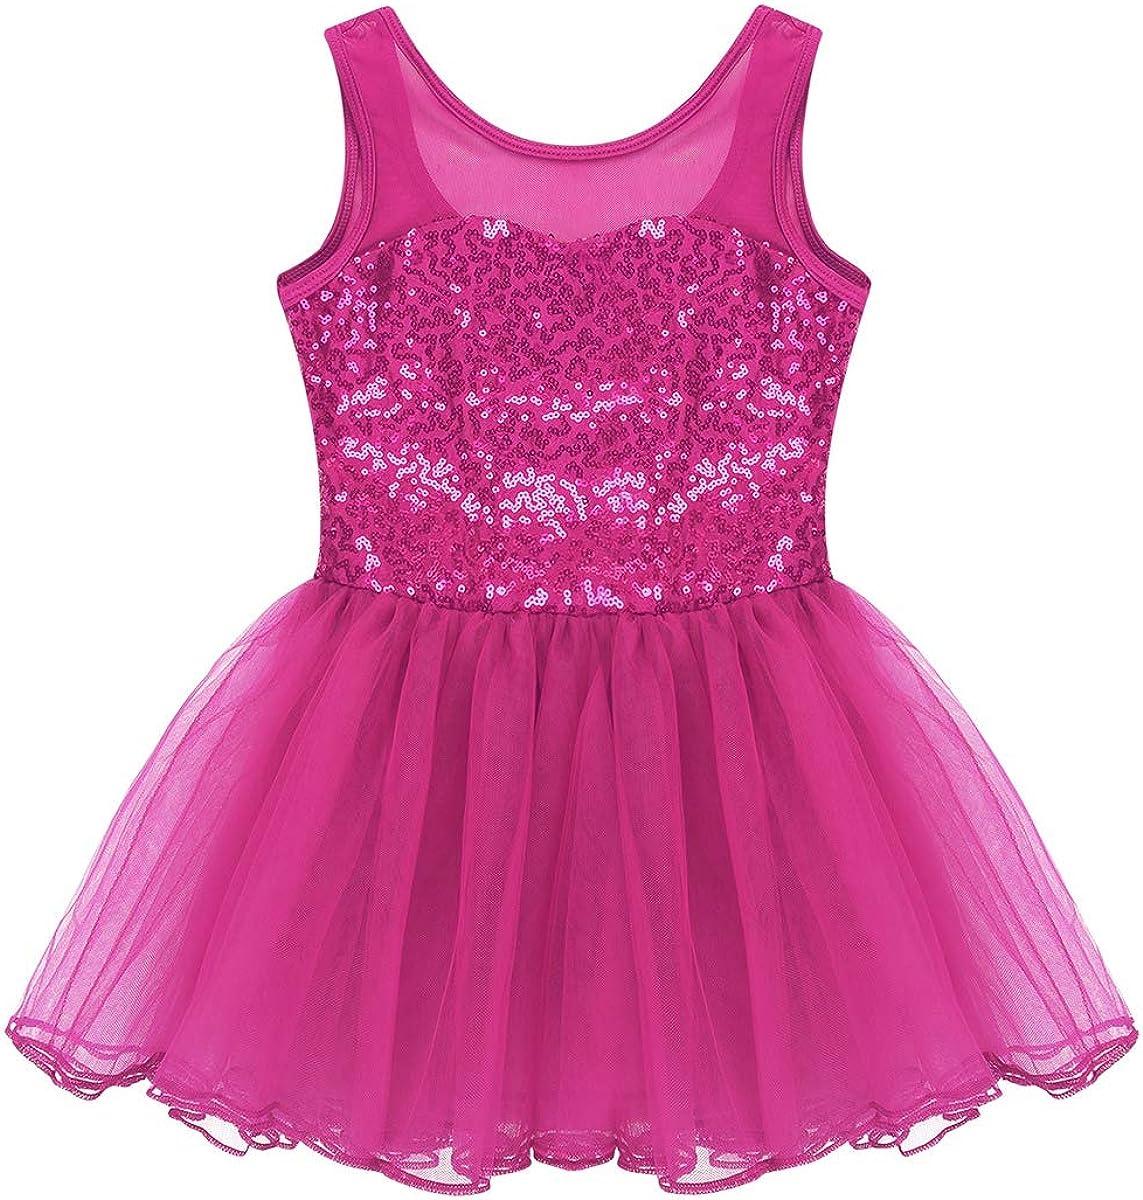 YiZYiF Justaucorps Danse Enfant Fille Robe Danse Ballet Latine Jazz Tutu Robe Patinage Gymnastique Robe /à Paillettes Body Robe Soir/ée Carnaval 3-14 Ans